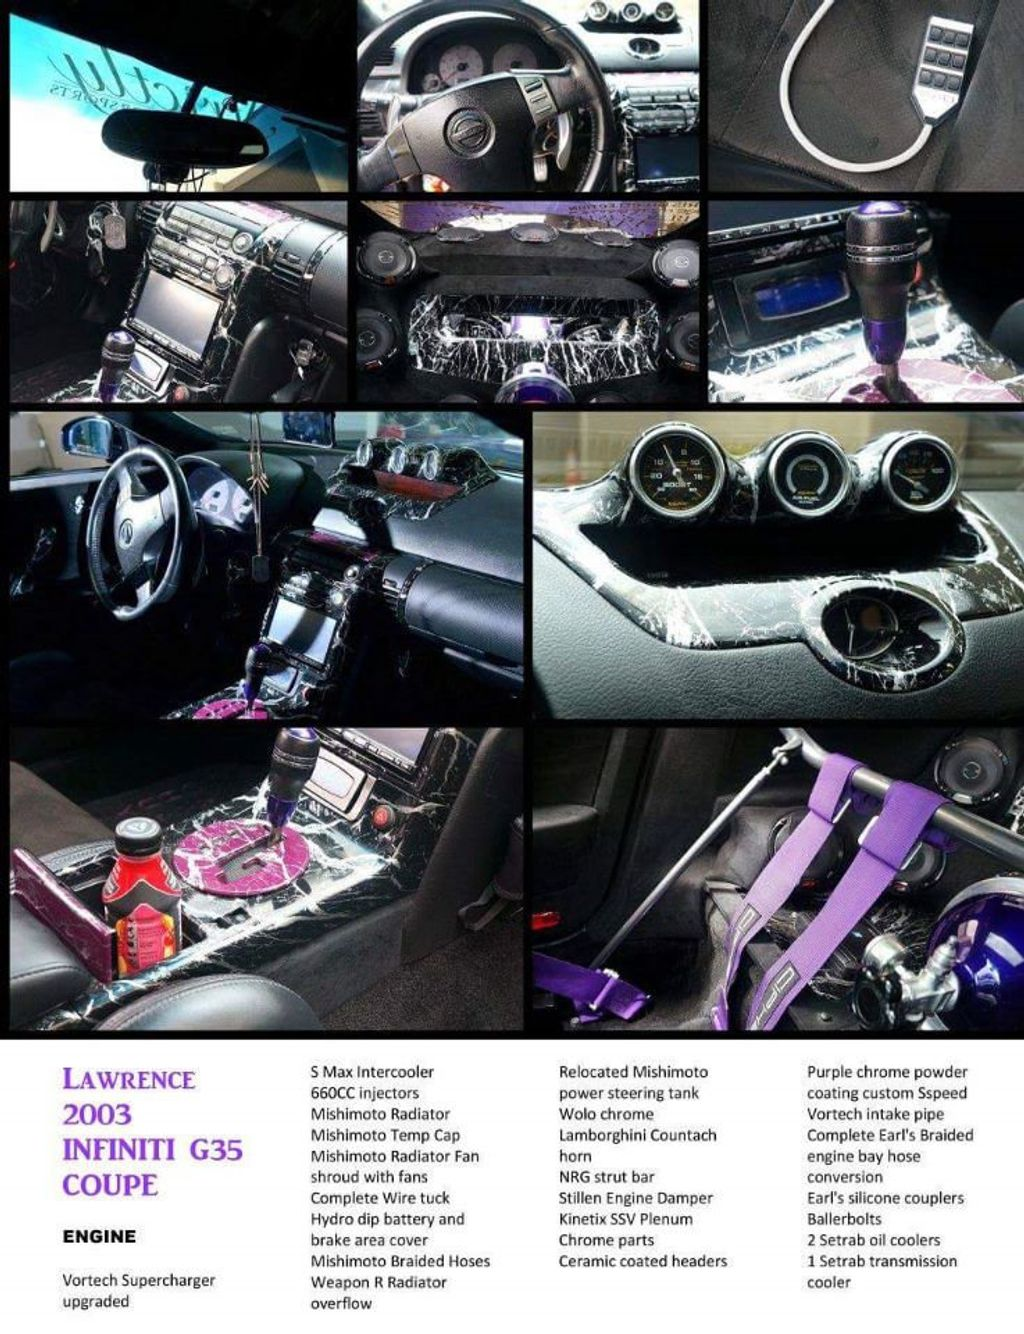 2003 Infiniti G35 Coupe Widebody 17572441 43